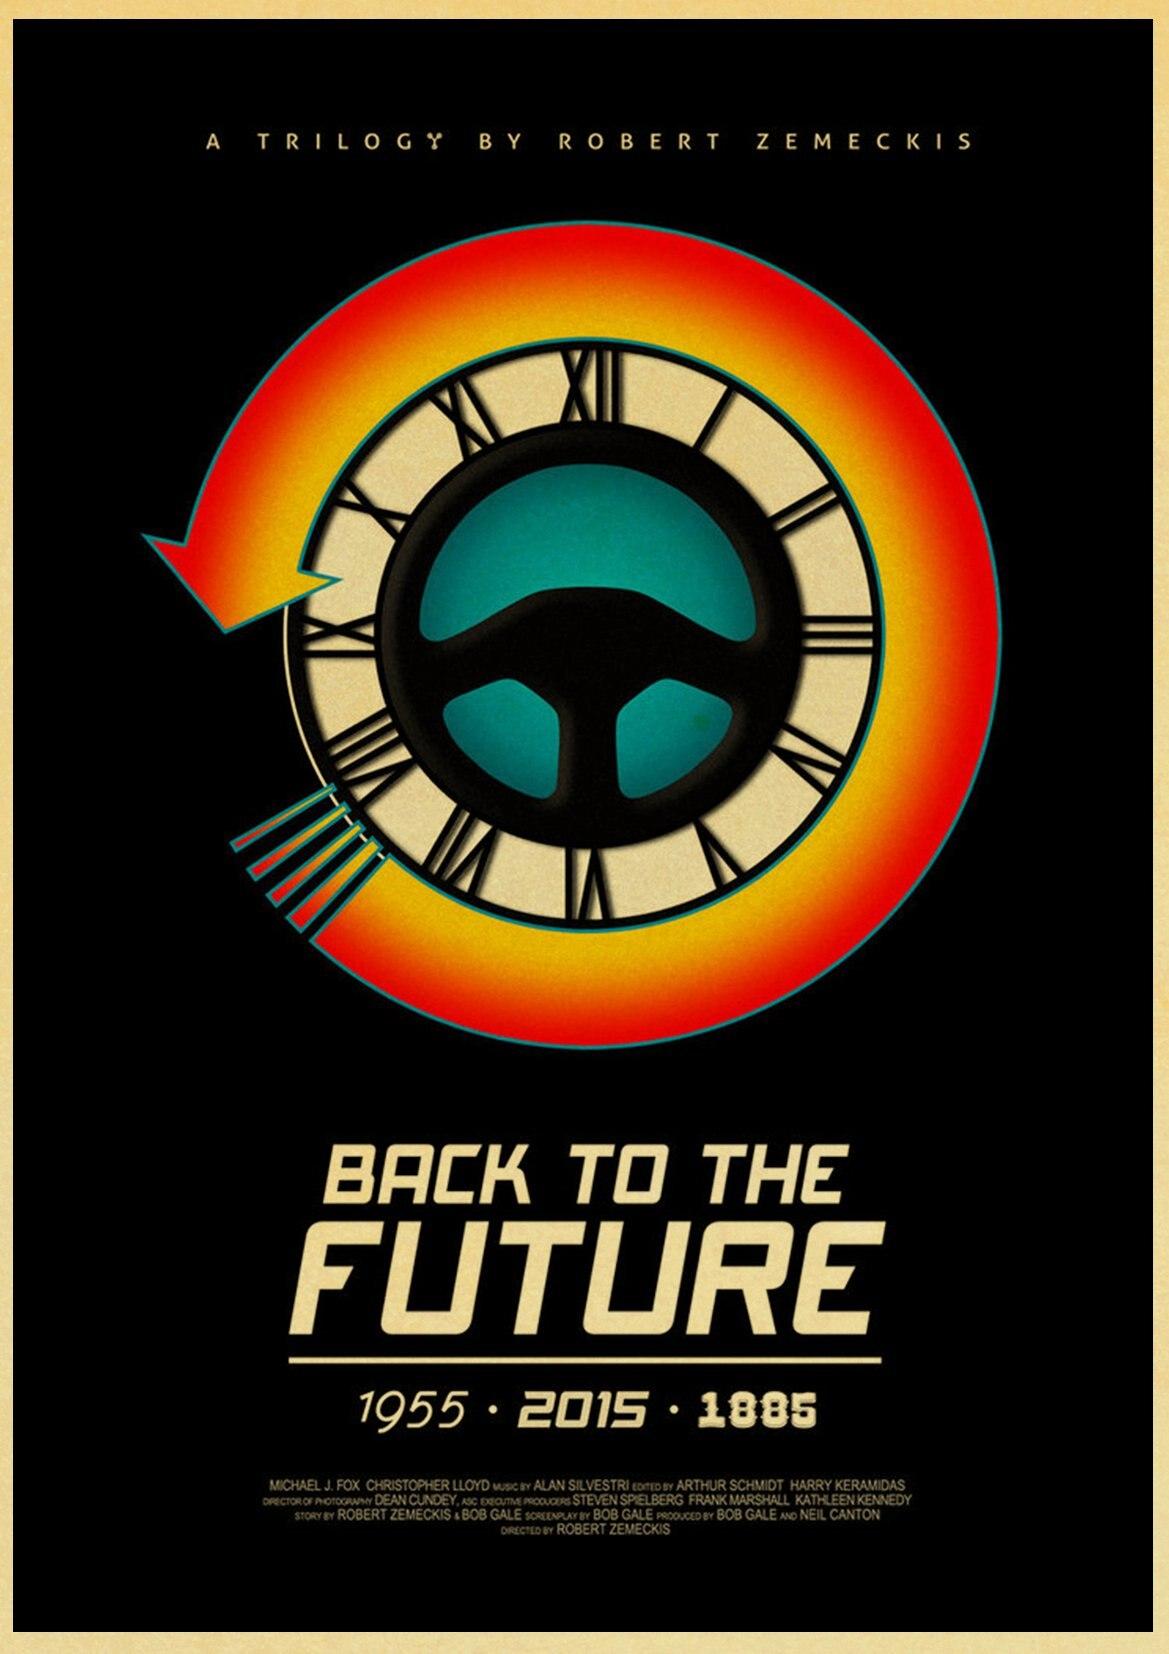 HTB1rd3bleuSBuNjy1Xcq6AYjFXa8 Sci-fi Back to The Future Film Propaganda Retro Kraft Poster Decorative DIY Wall Canvas Sticker Home Bar Art Posters Decor